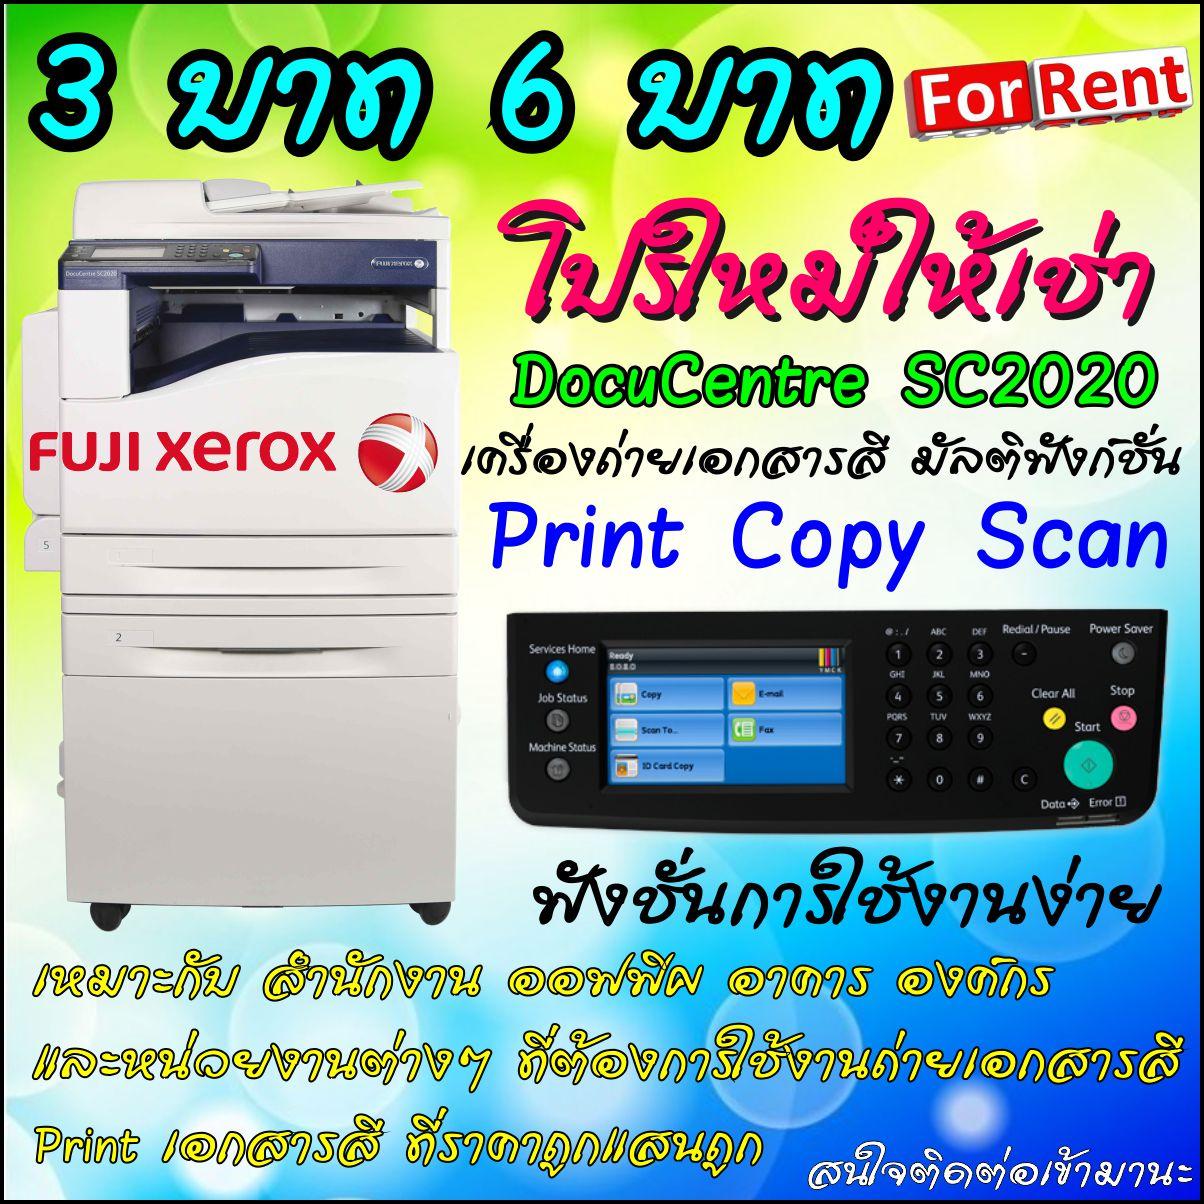 Fuji Xerox DocuCentre SC2020 เครื่องมัลติฟังชั่นสี A4, A3